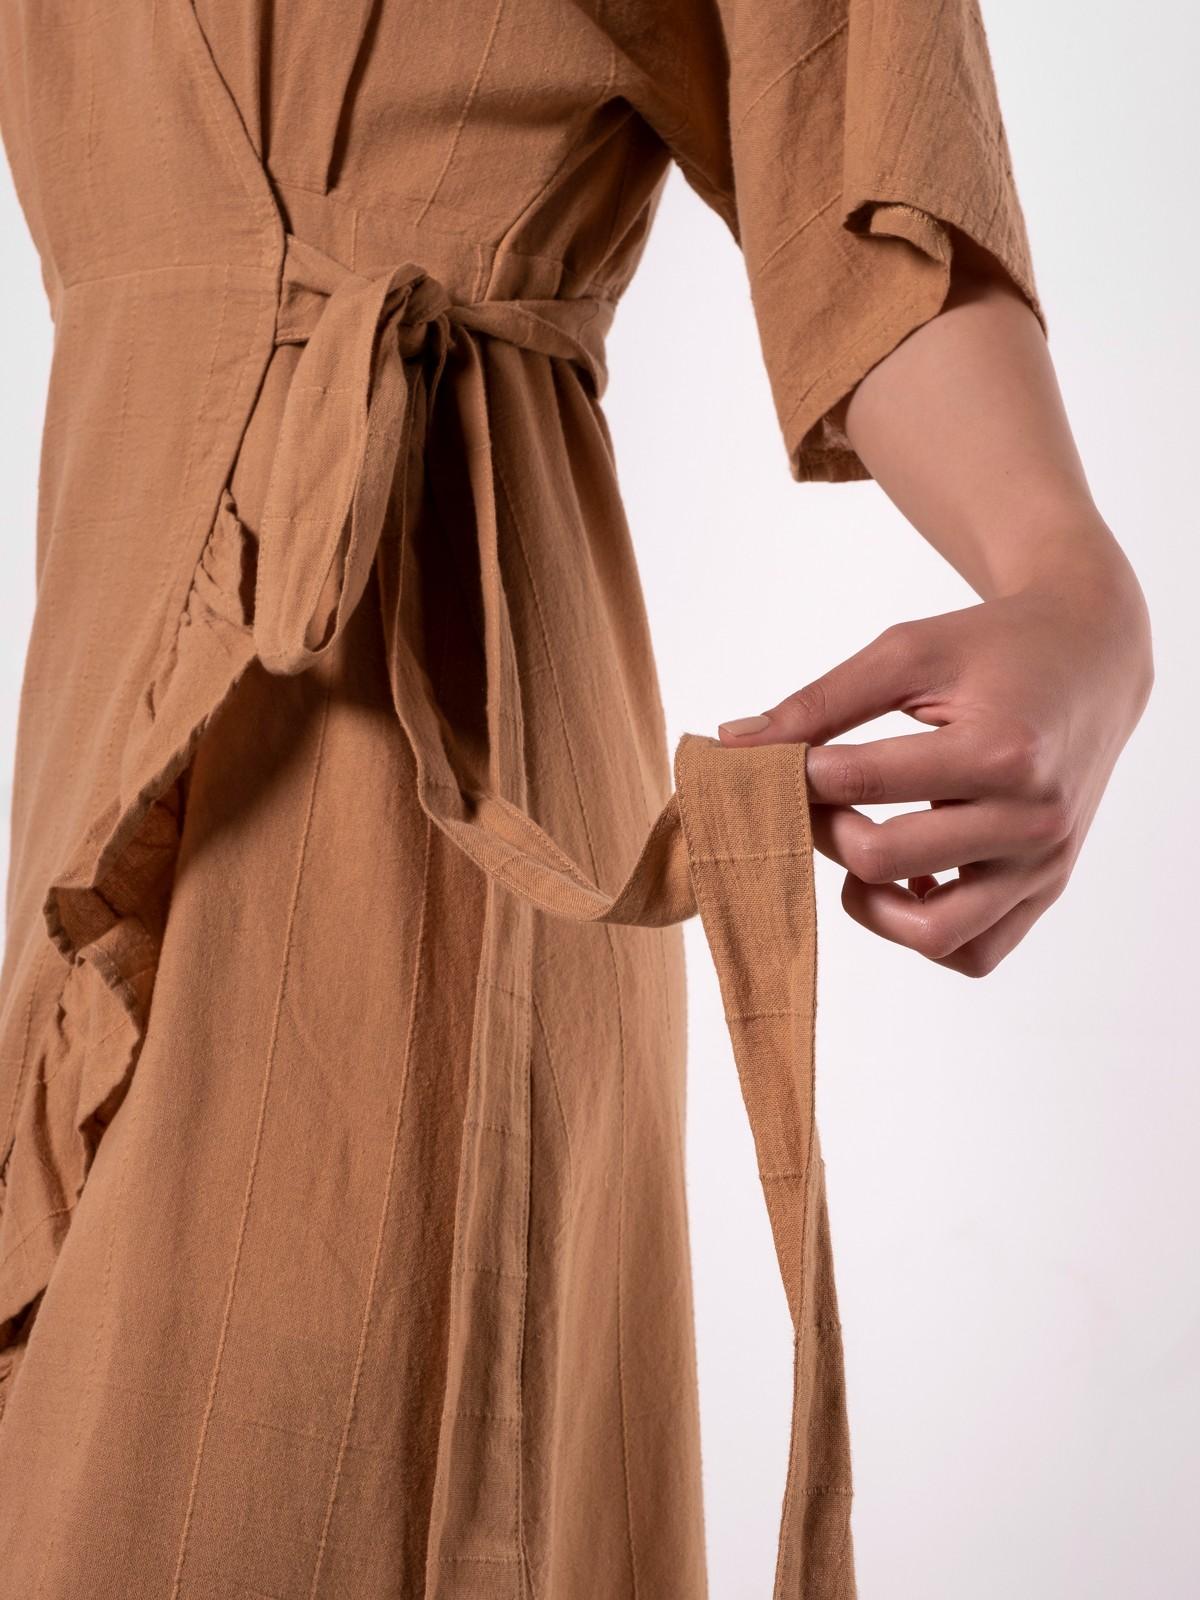 frilled-dress-indiantan2-1200x1600w